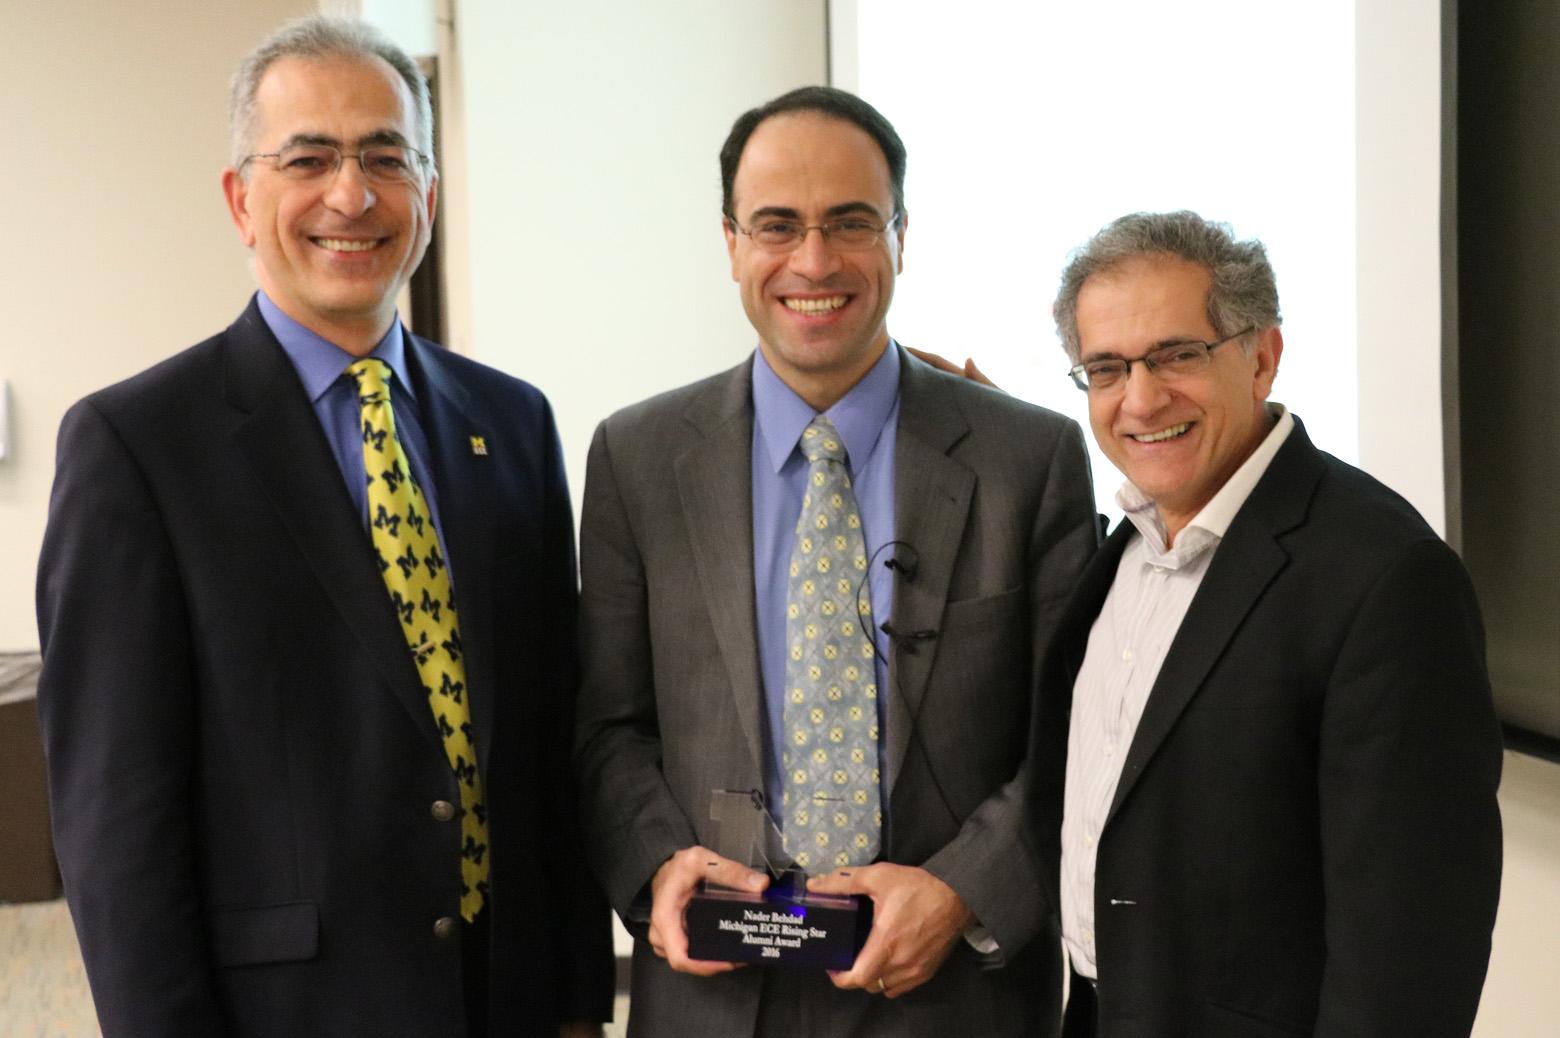 Nader Behdad ECE Rising Star Award